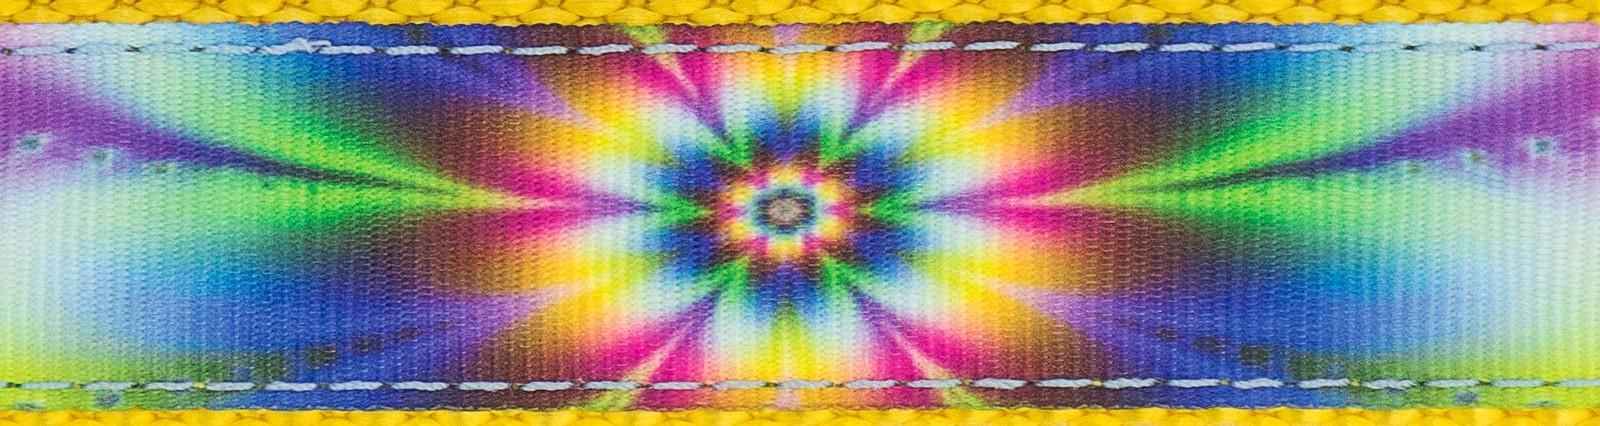 Buy 3 4 inch tie dye flowers on gold nylon webbing online for Order tie dye roses online